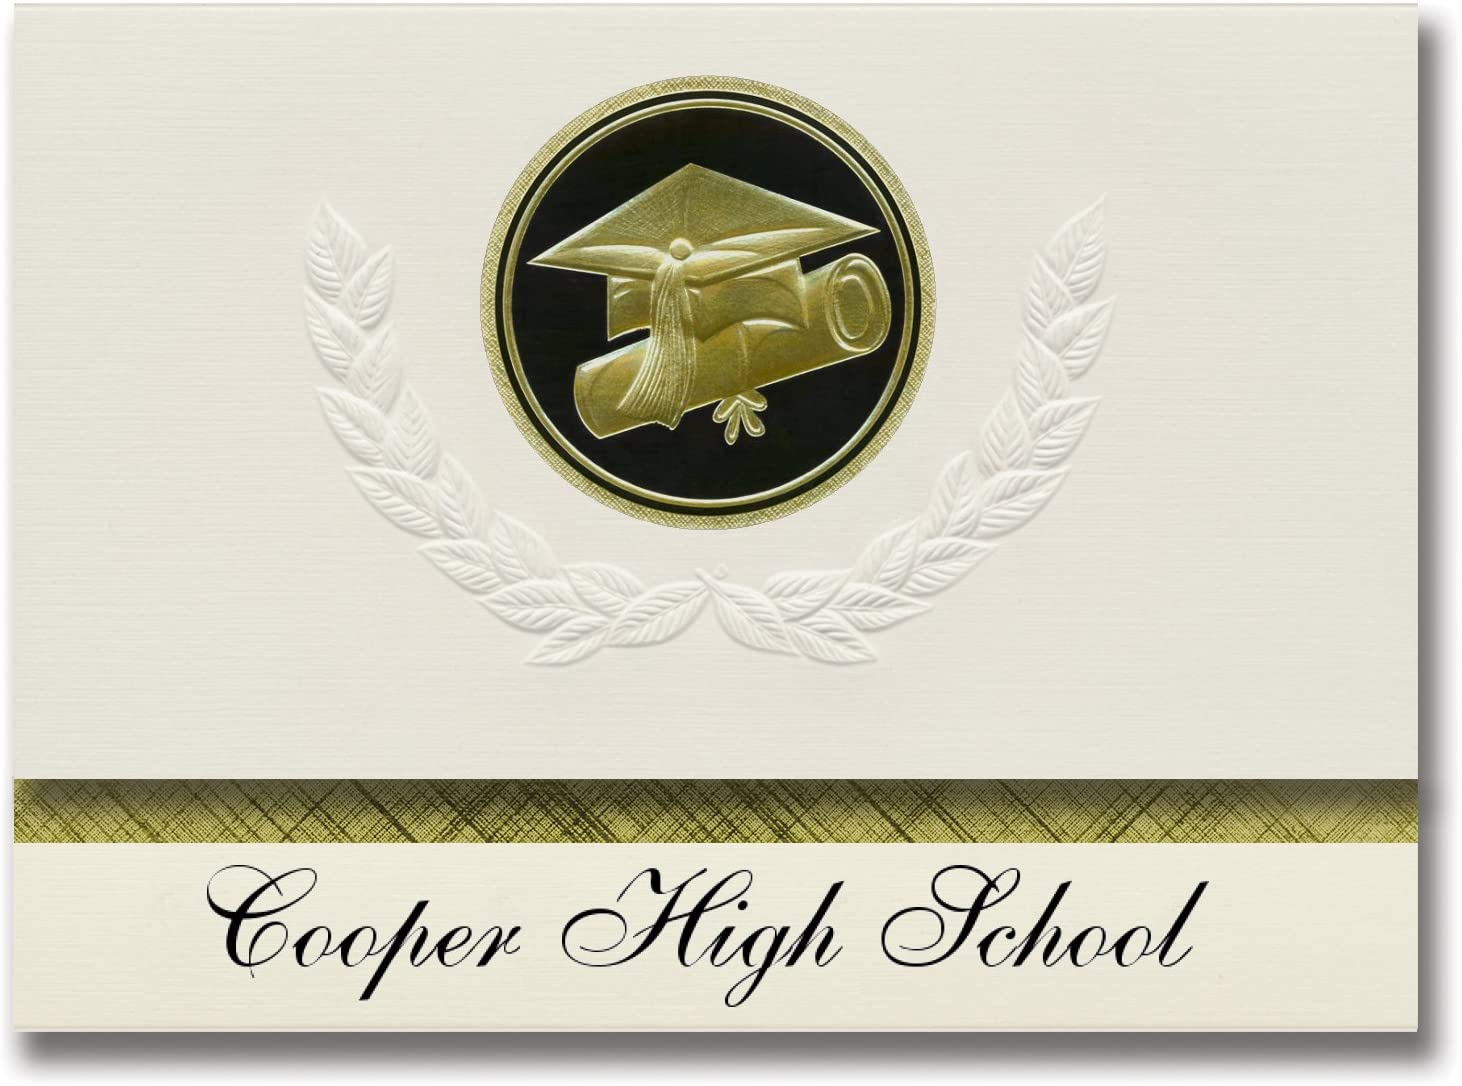 Signature Announcements Cooper High School (Abilene, TX) Graduation Announcements, Presidential style, Elite package of 25 Cap & Diploma Seal Black & Gold